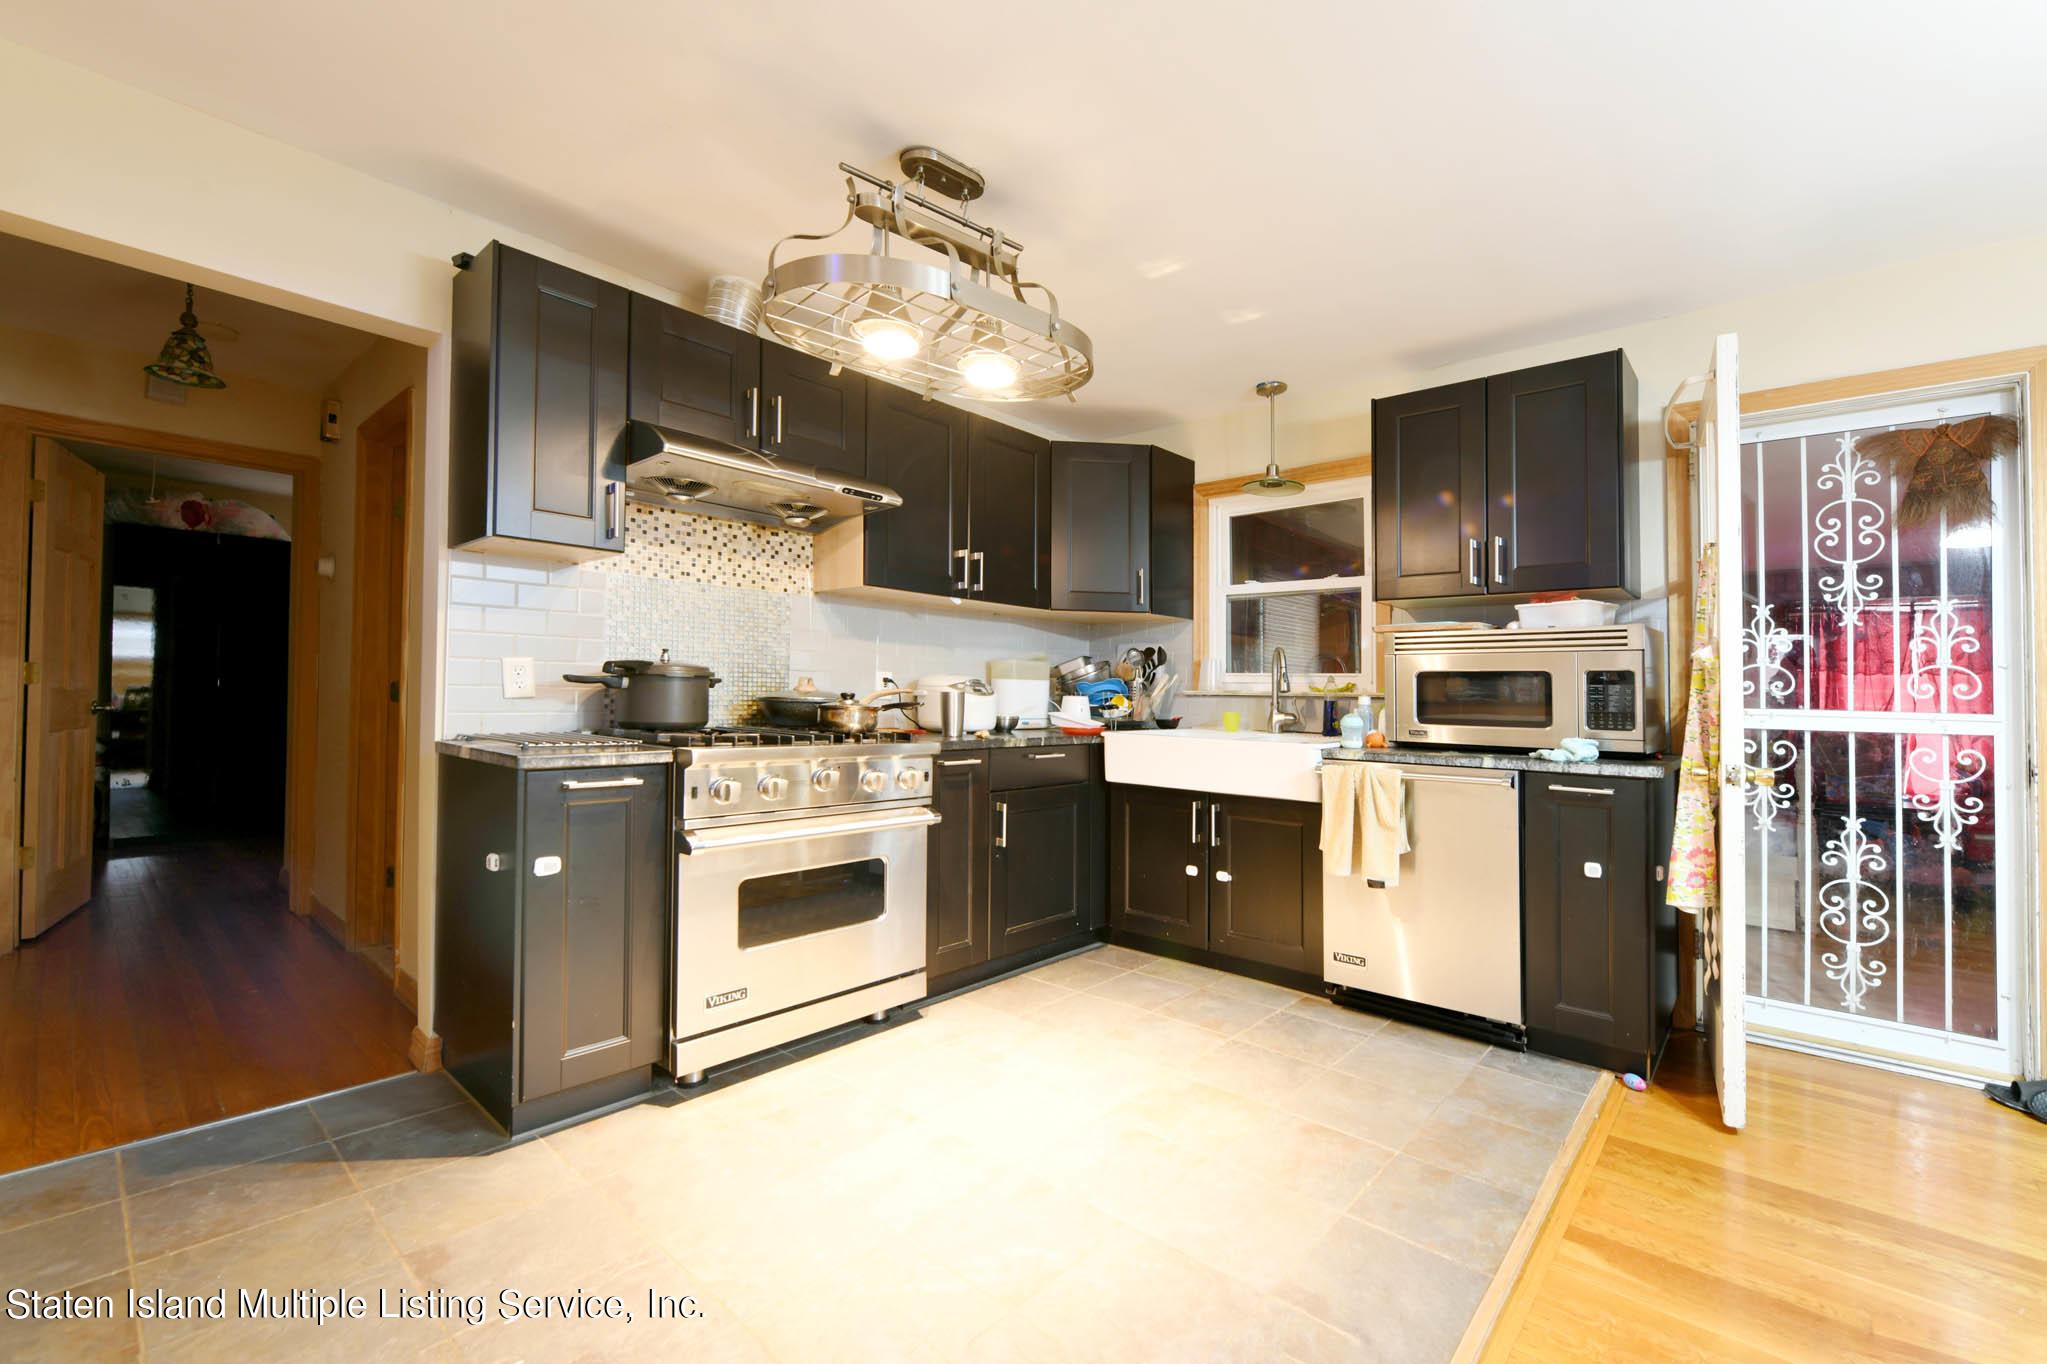 Single Family - Detached 110 Ravenhurst Avenue  Staten Island, NY 10310, MLS-1143189-4